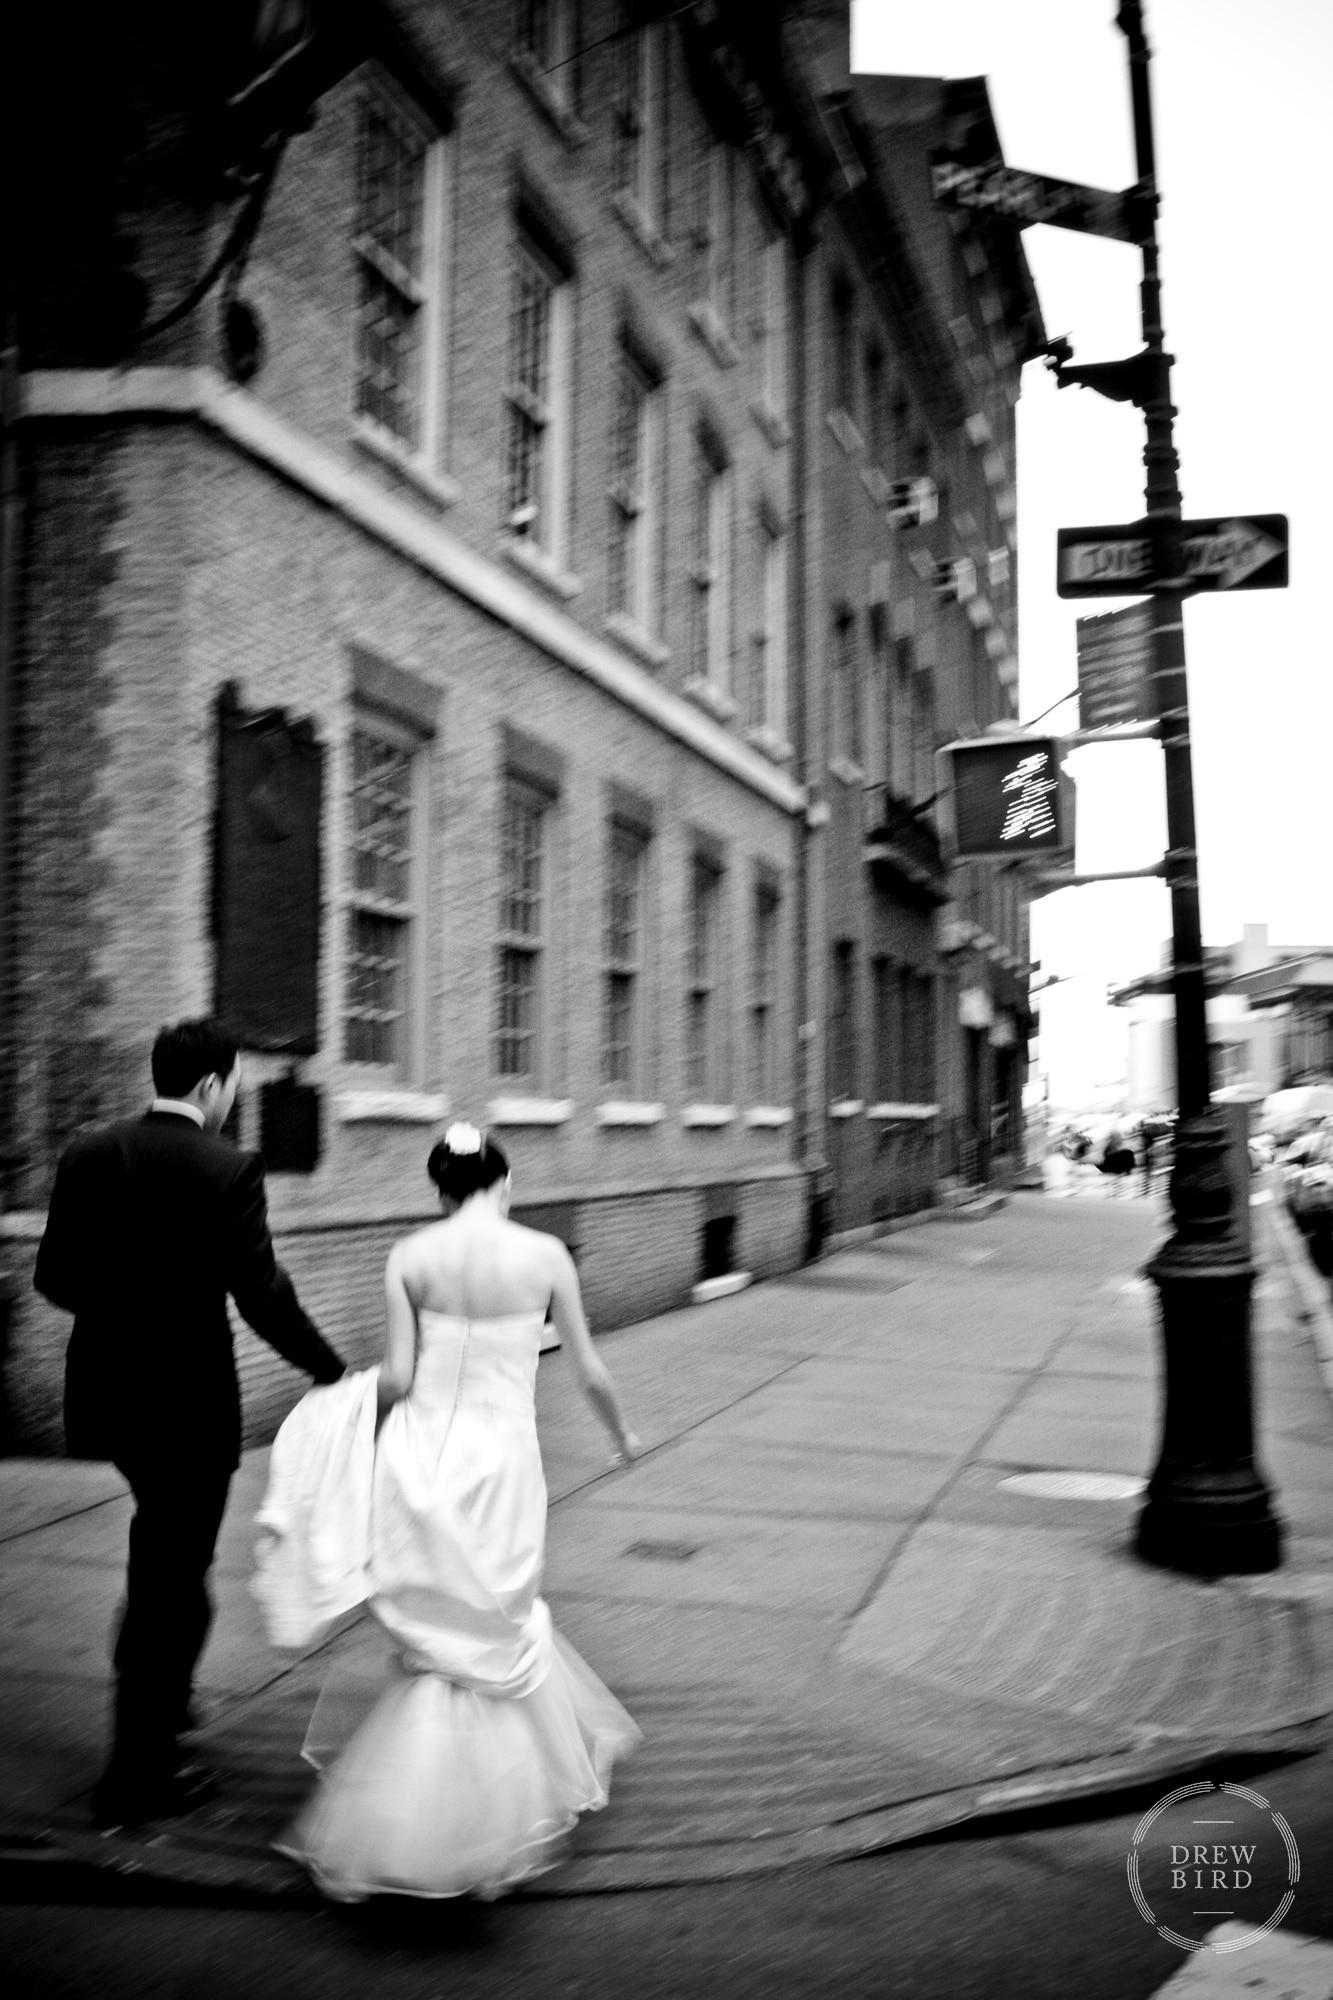 Drew Bird Photography | San Francisco Wedding Photography | Oakland Wedding Photographer | East Bay Wedding Photojournalist